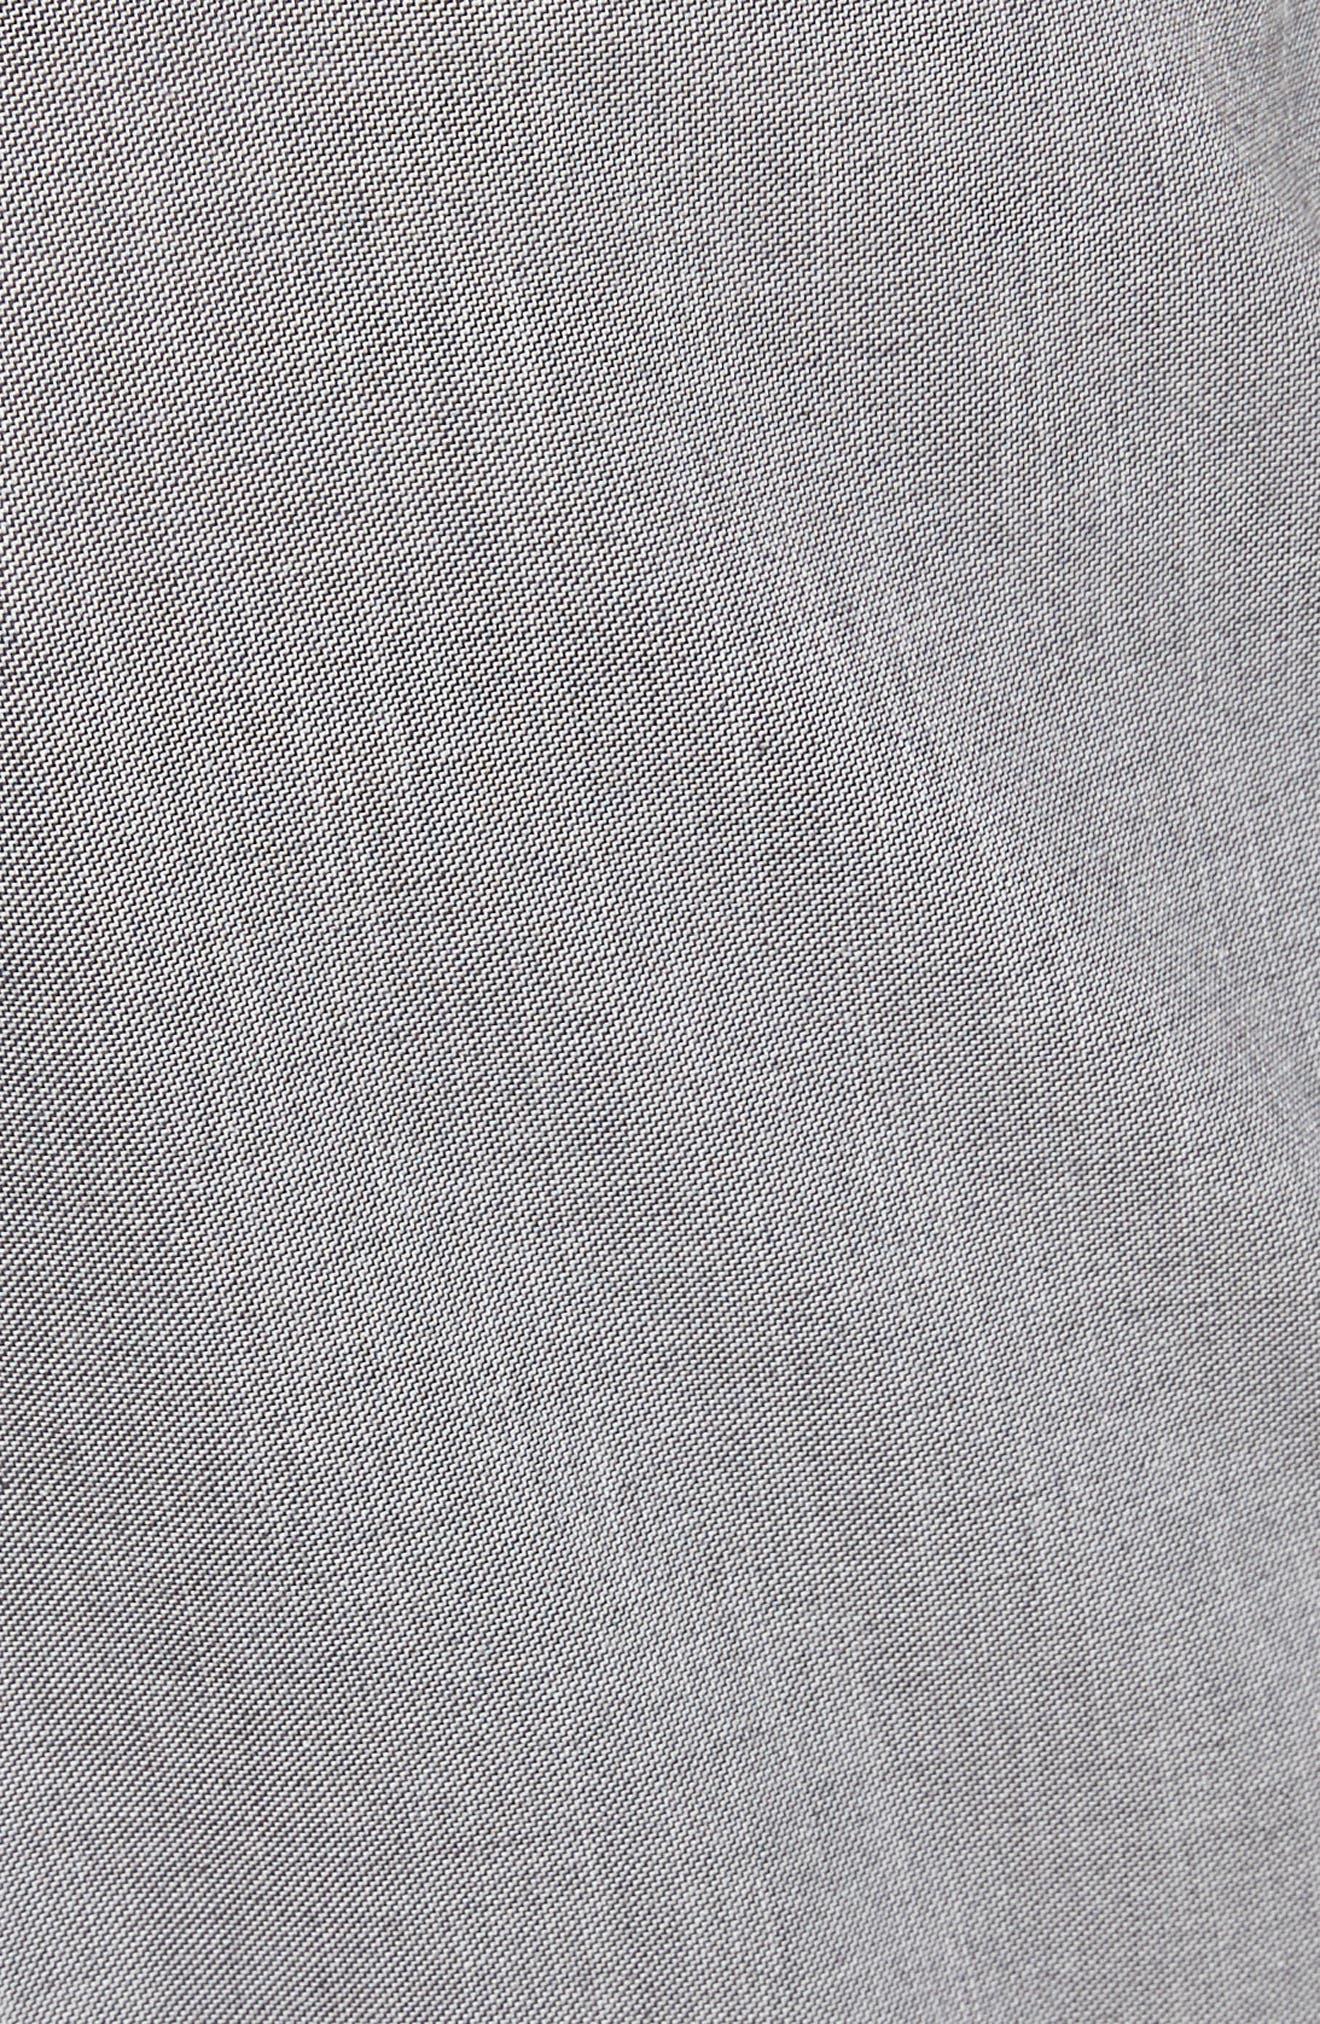 French Pocket Stretch Straight Leg Pants,                             Alternate thumbnail 2, color,                             020